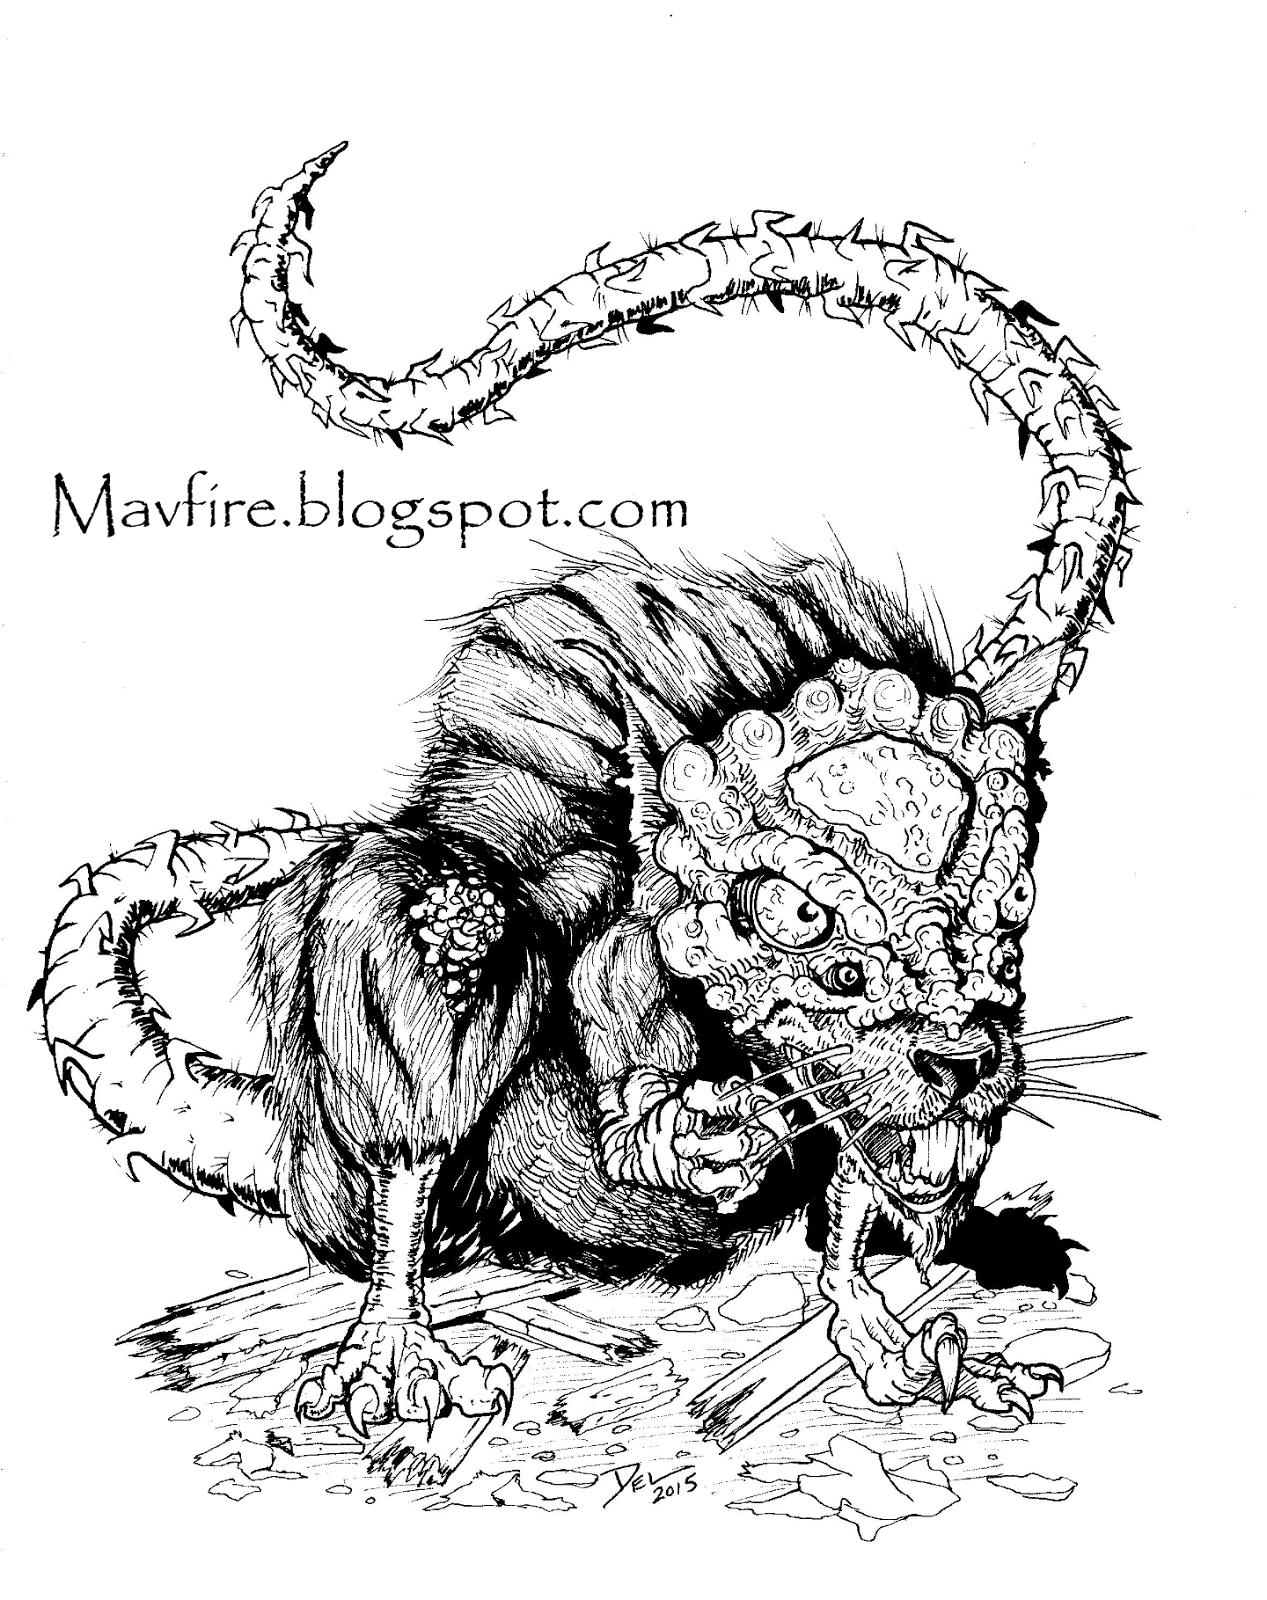 Hesaki Rat by Del Teigeler, Mavfire